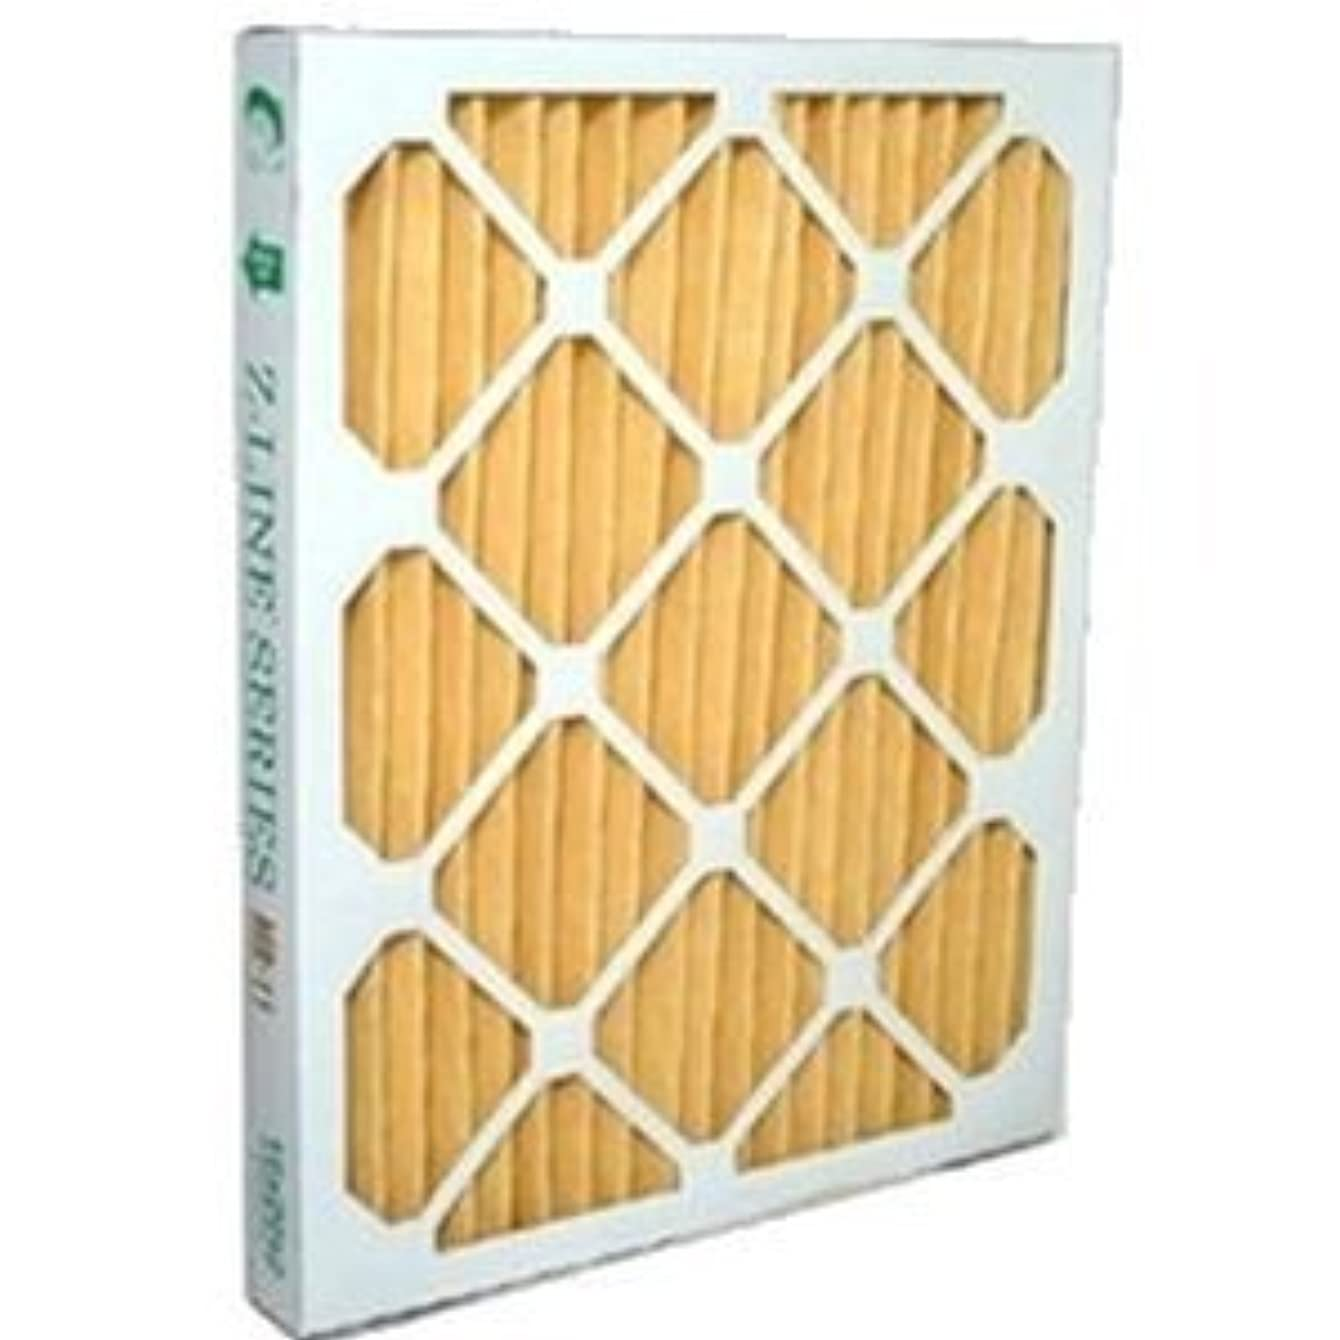 IAQ Living SaniDry CX Dehumidifier MERV 11 Replacement Filter 15 3/4 x 10 1/4 x 1 6-Pack